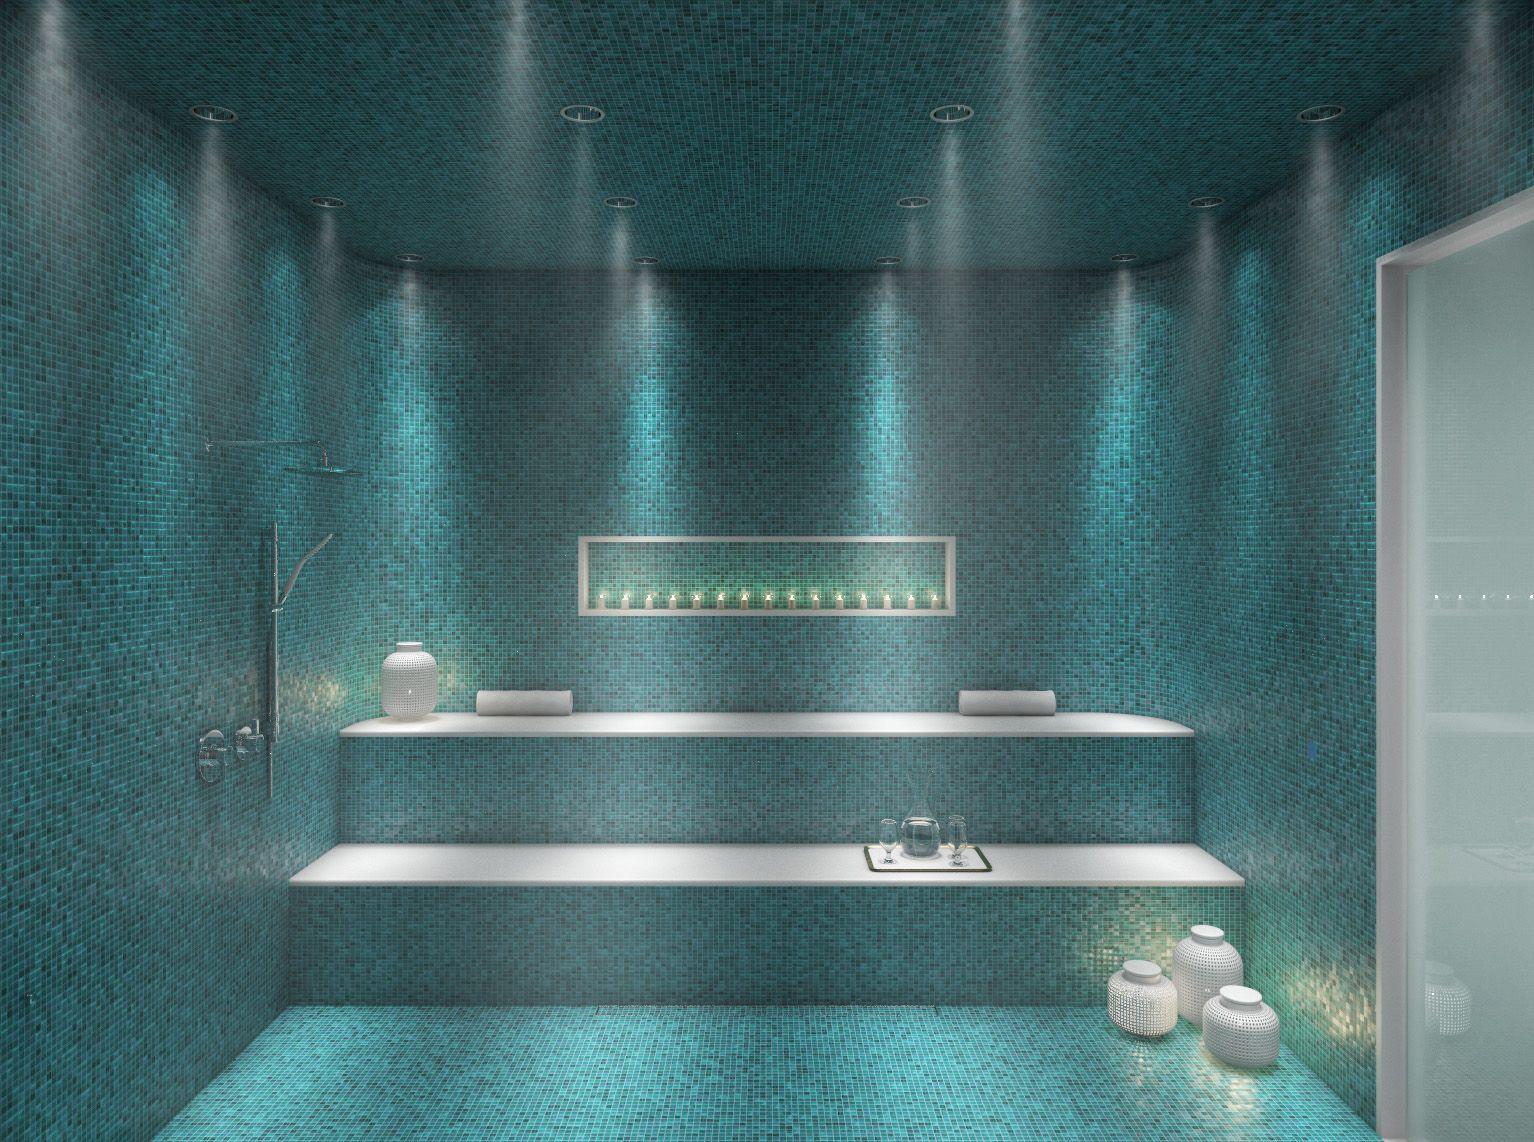 steam room spa - Google Search | Steam Room | Pinterest | Steam room ...